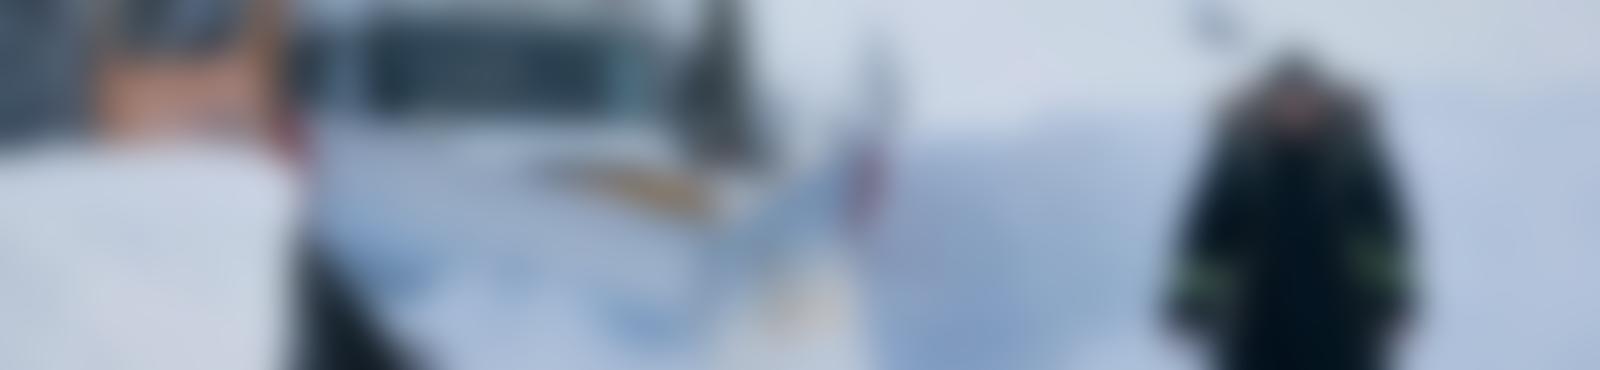 Blurred 7228348a ecea 44c7 9727 e22e2e5f0023